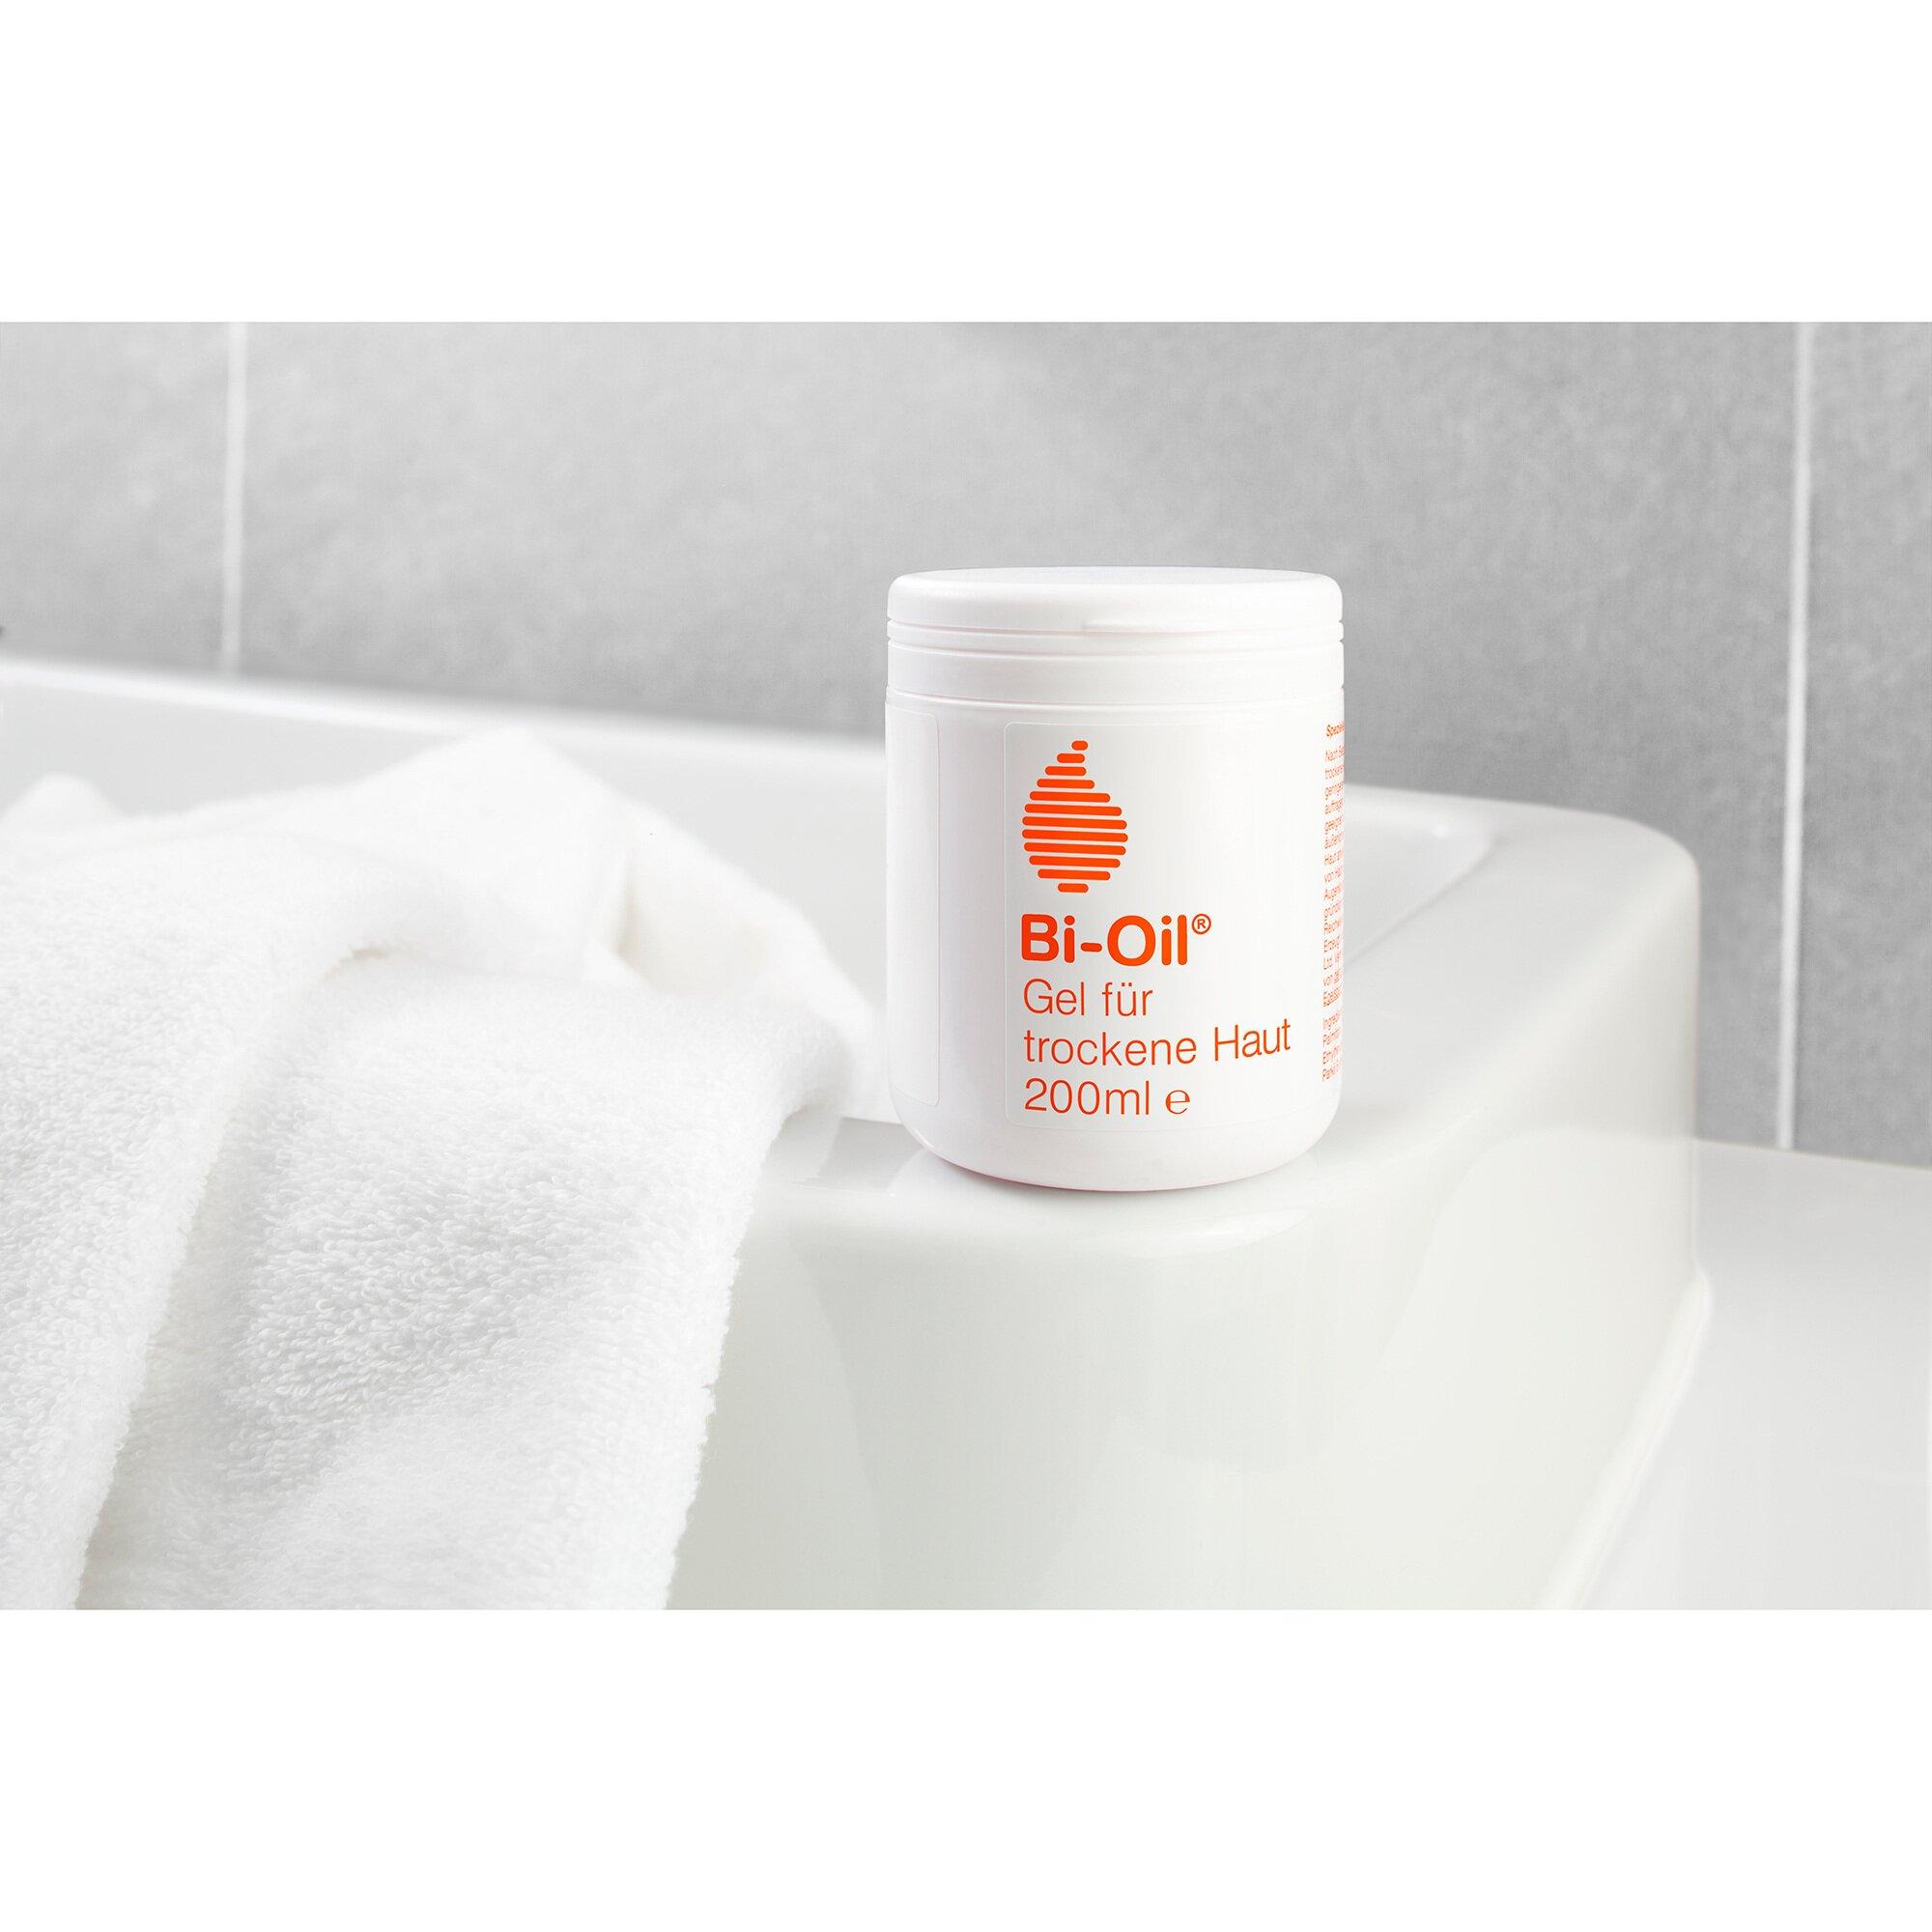 bi-oil-bi-oil-gel